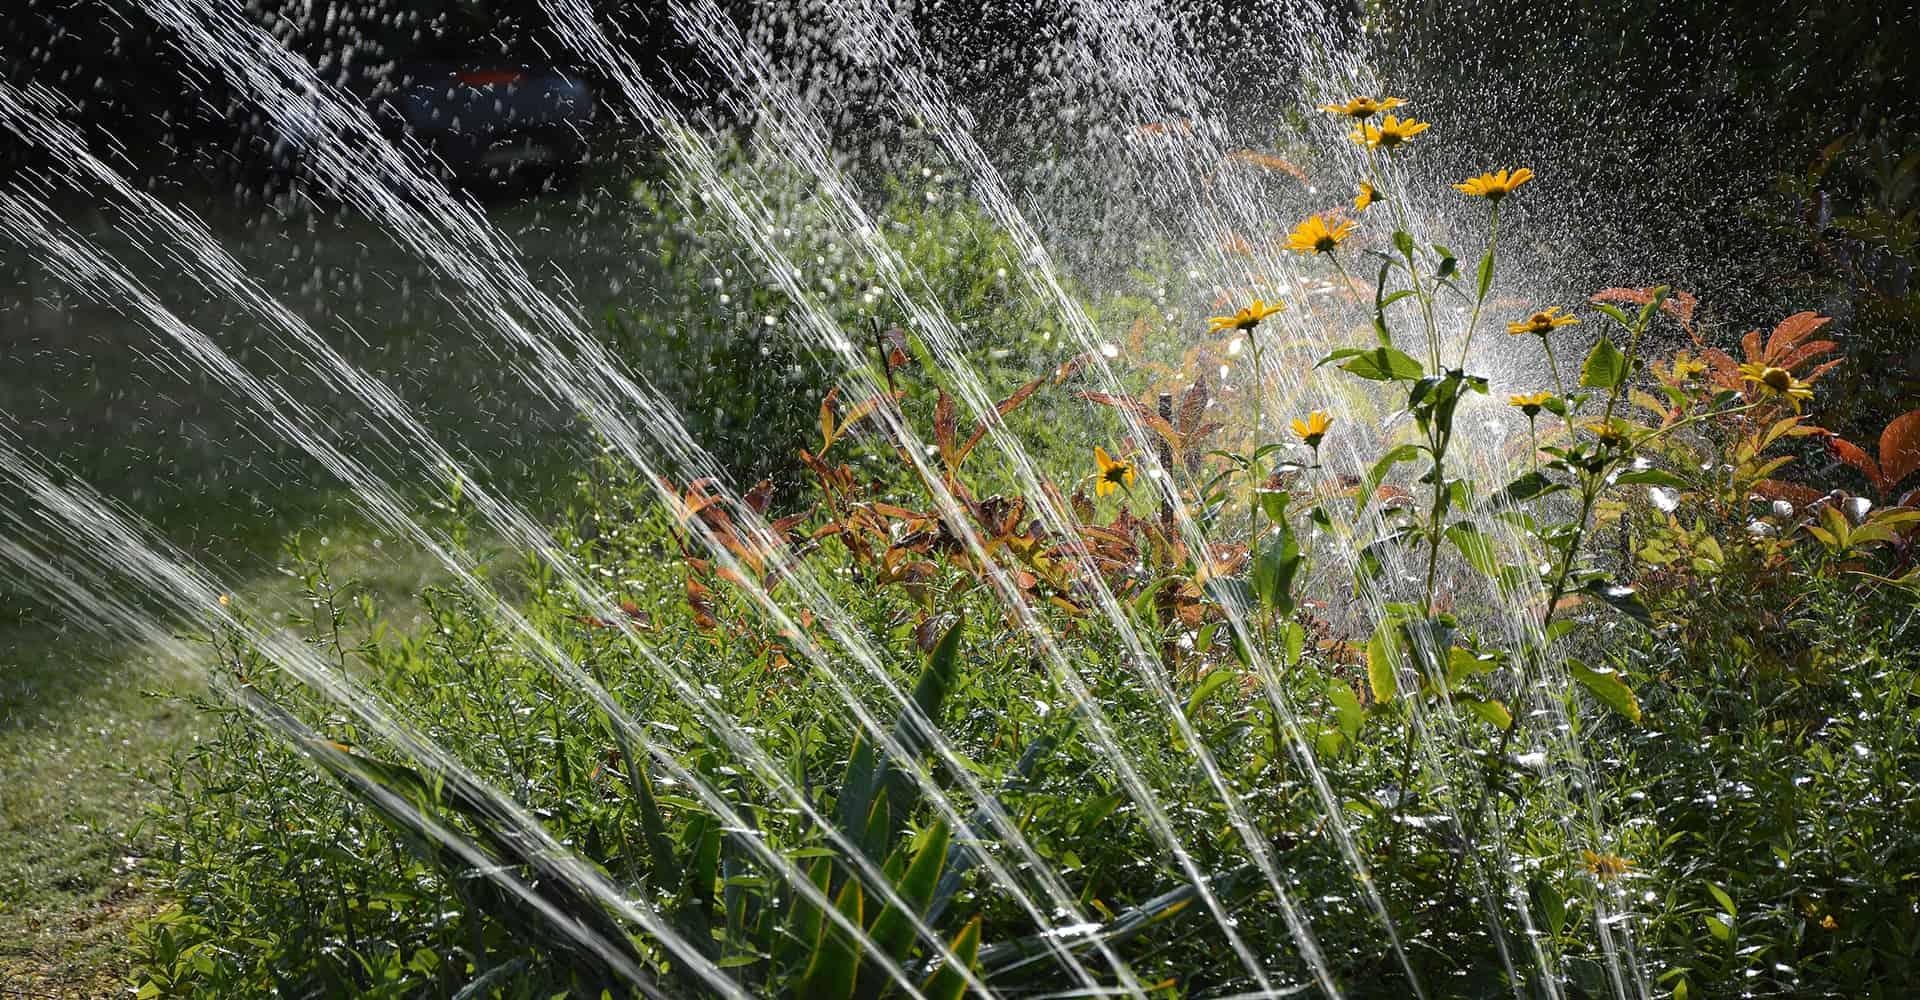 4 Best Lawn Amp Garden Sprinklers Uk Dec 2019 Review